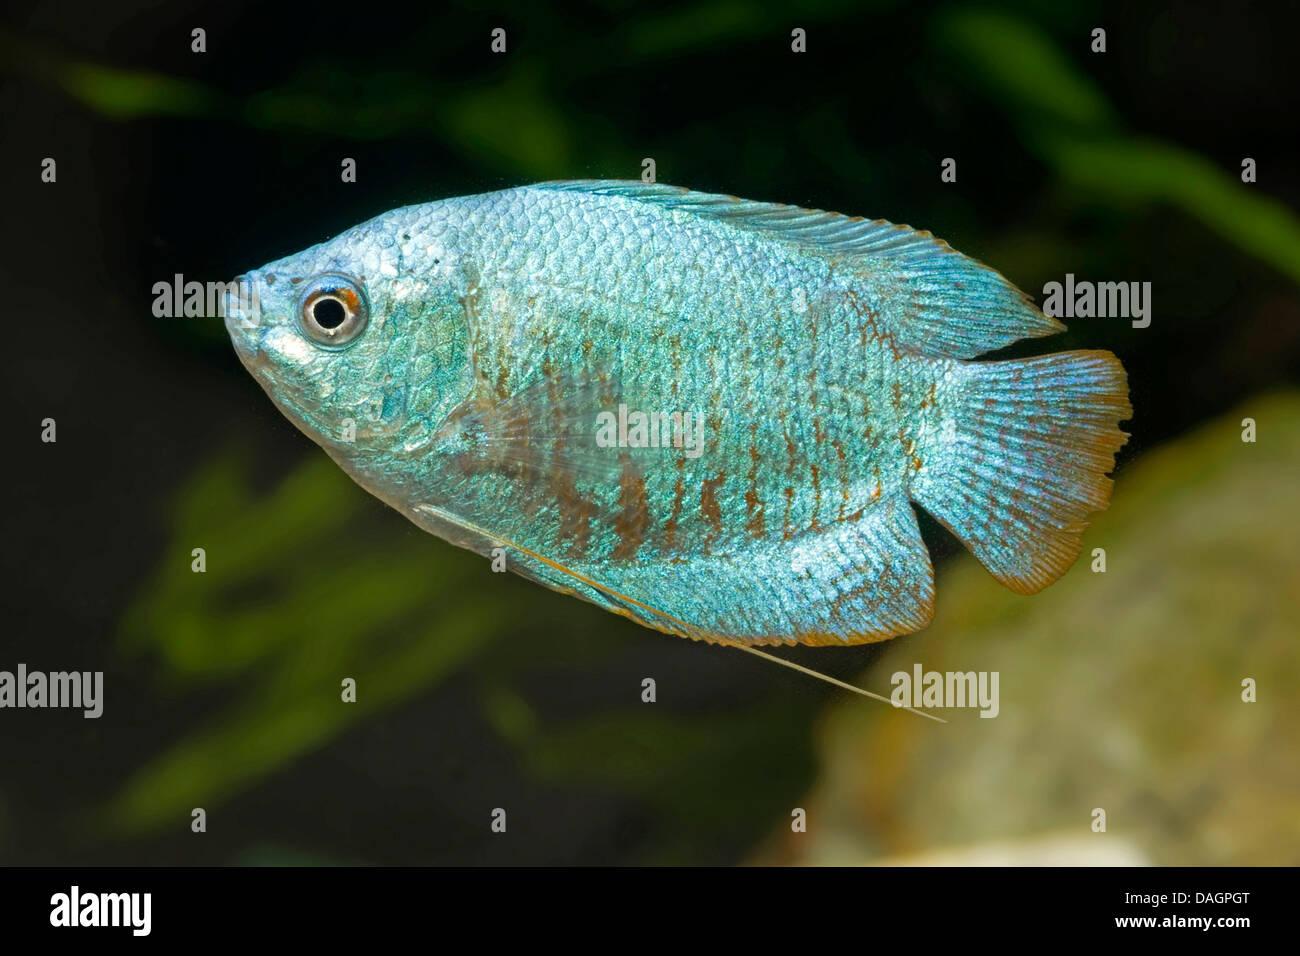 Gourami Fish Breeding   Dwarf Gourami Colisa Lalia Blue Kobalt Breed Blue Kobalt Stock